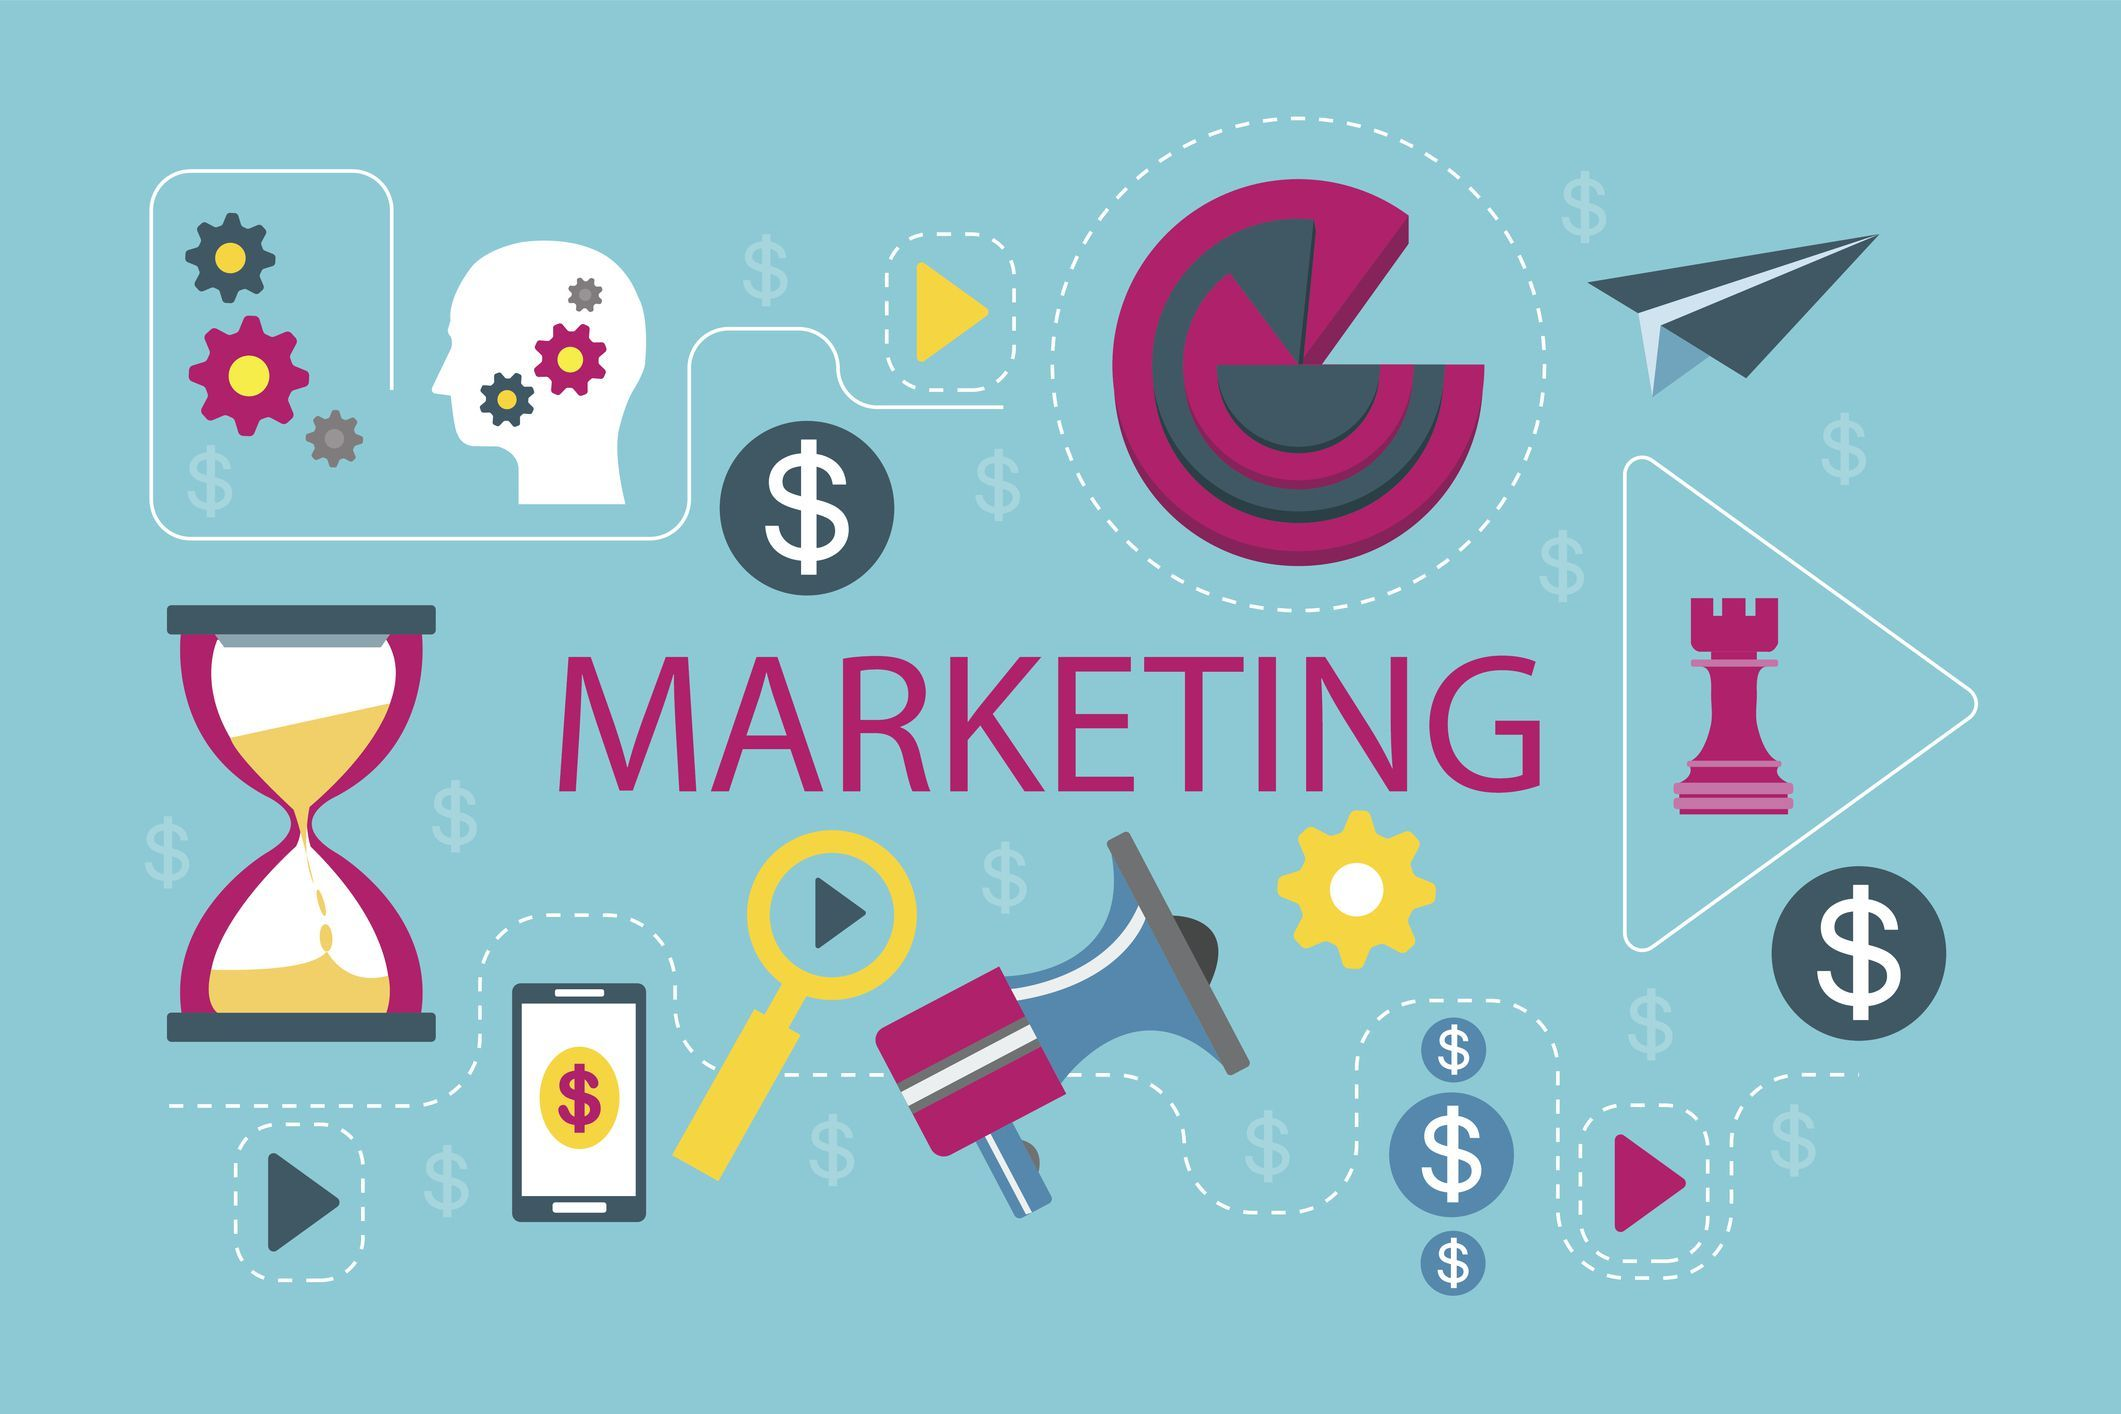 55 Free Digital Marketing Tools For Small Businesses Digital Marketing Tools Small Business Marketing Tools Digital Marketing